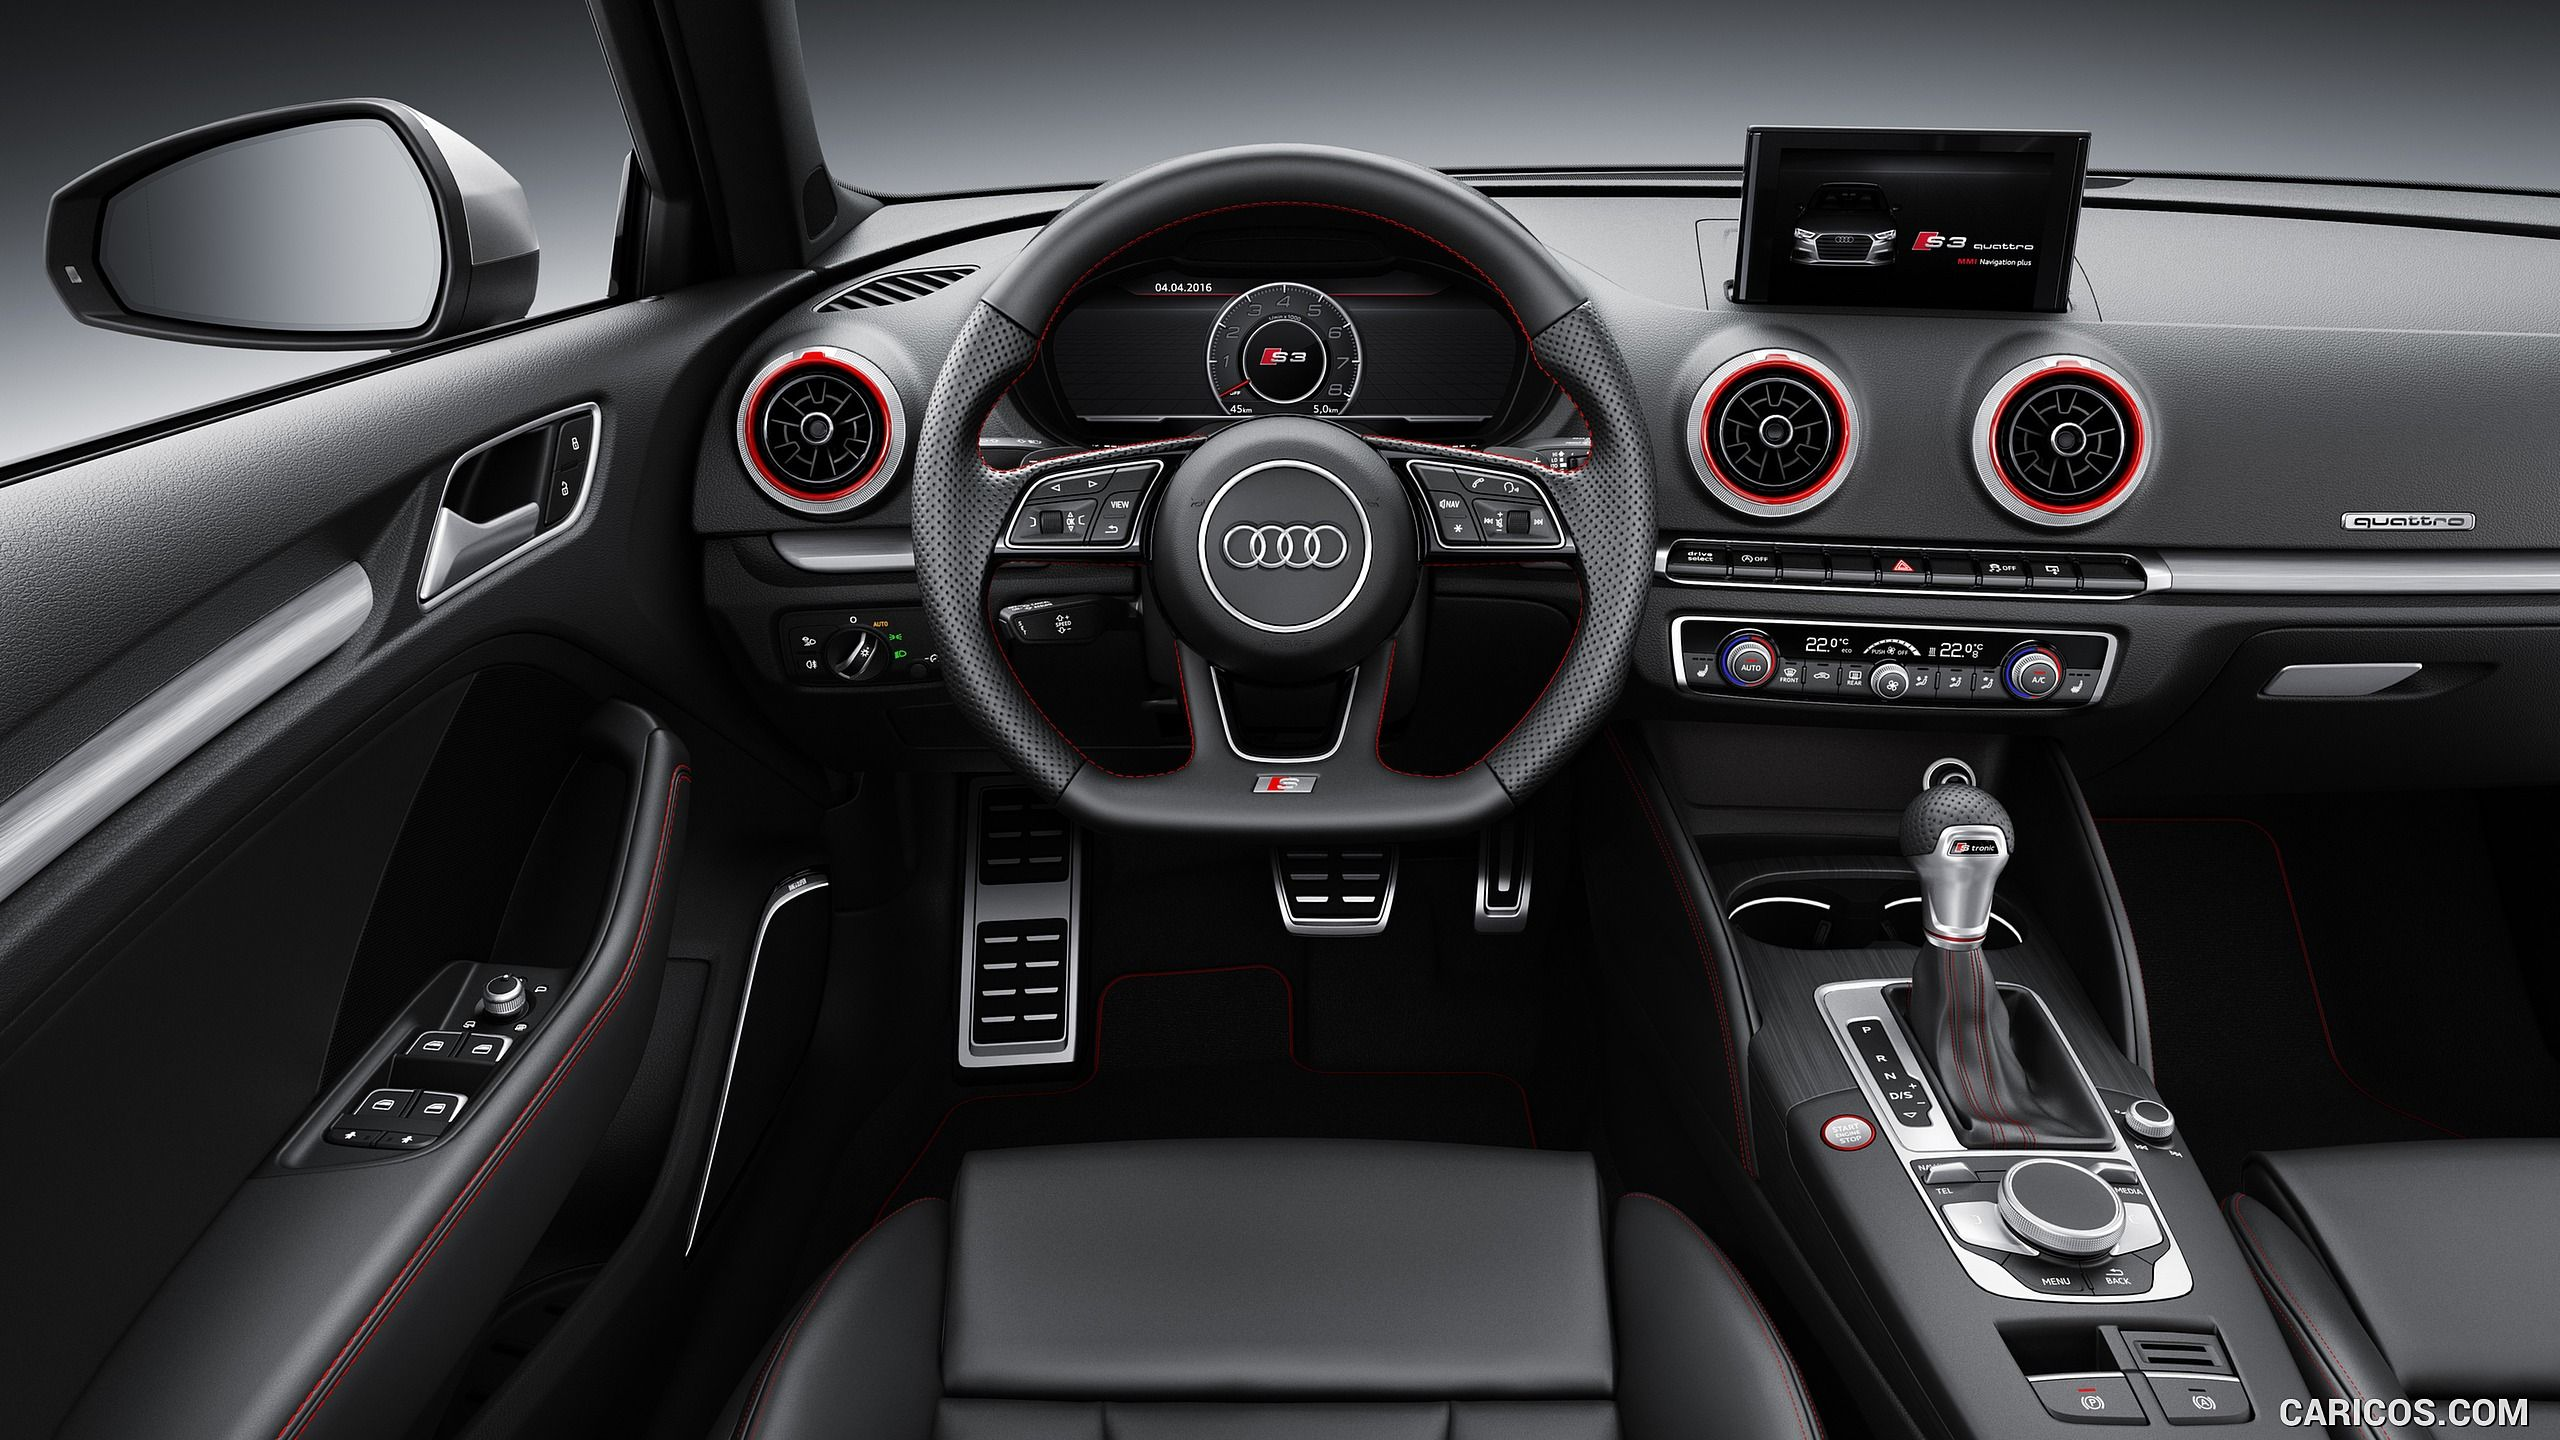 2017 Audi S3 Sportback Interior, Cockpit HD Mustang